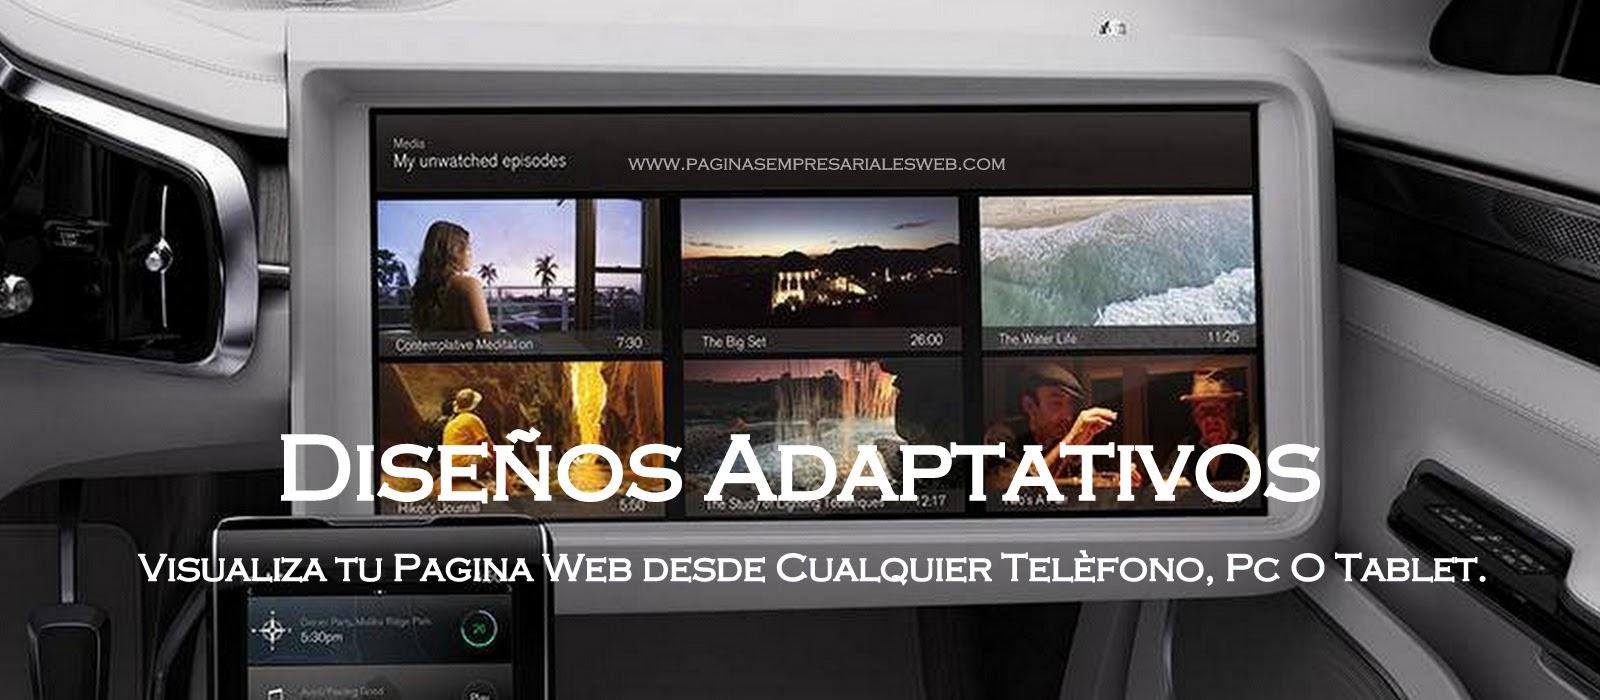 http://www.desing-hosting-dominio.paginasempresarialesweb.com/